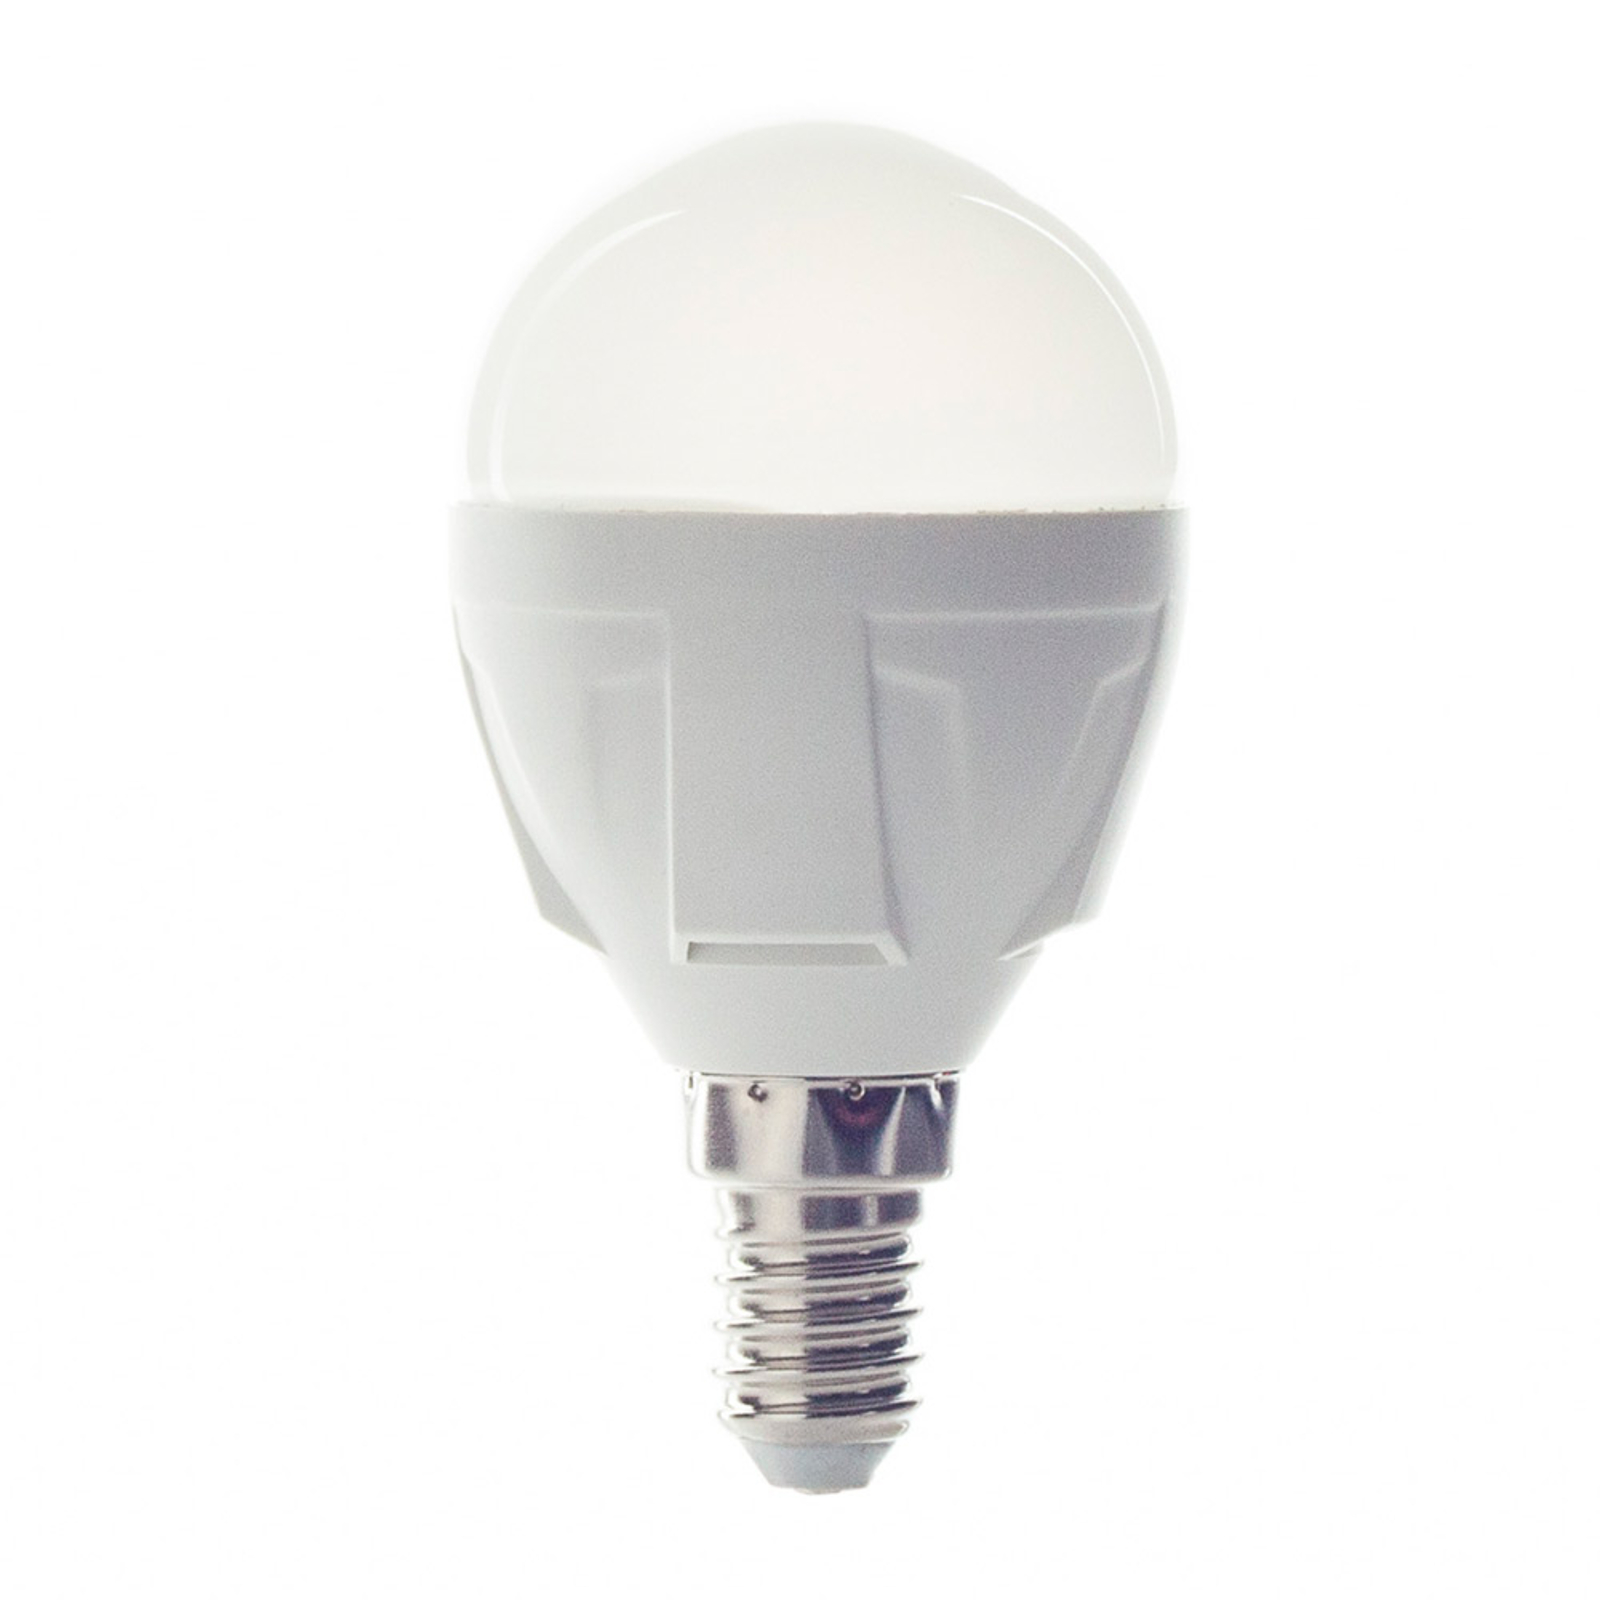 Bombilla LED E14 6W 830 gota blanco cálido